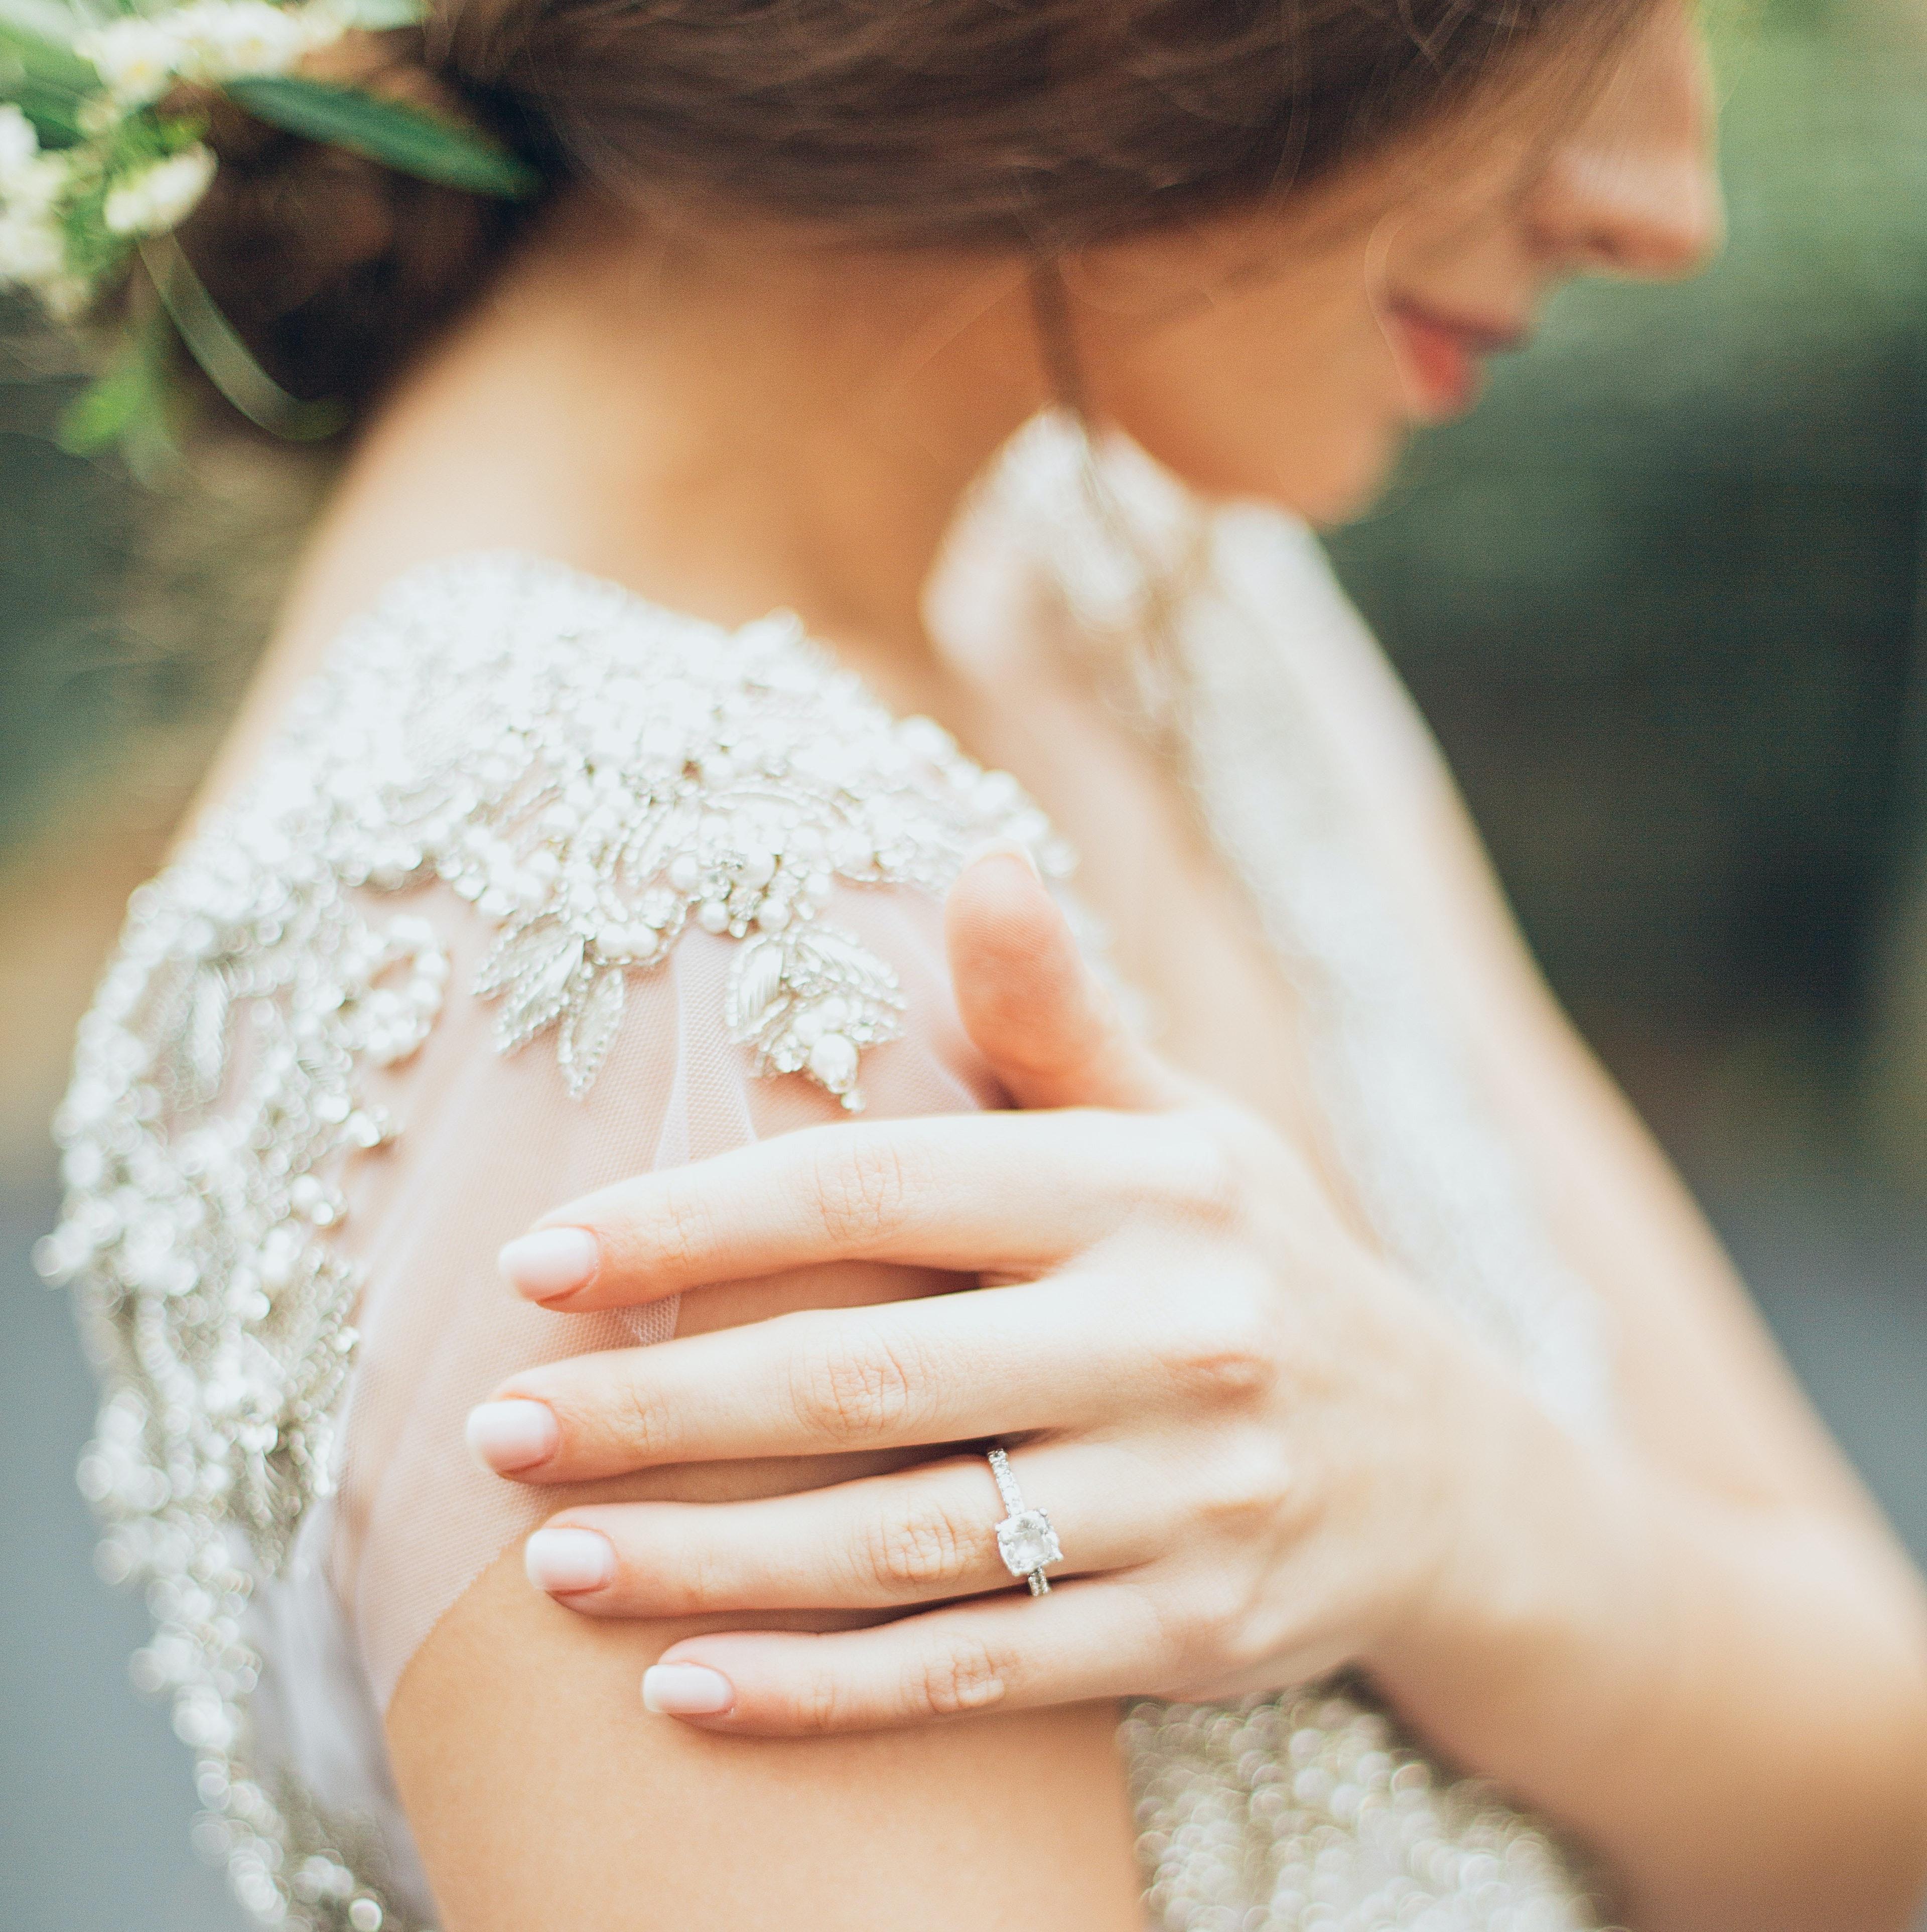 Wedding expert advice